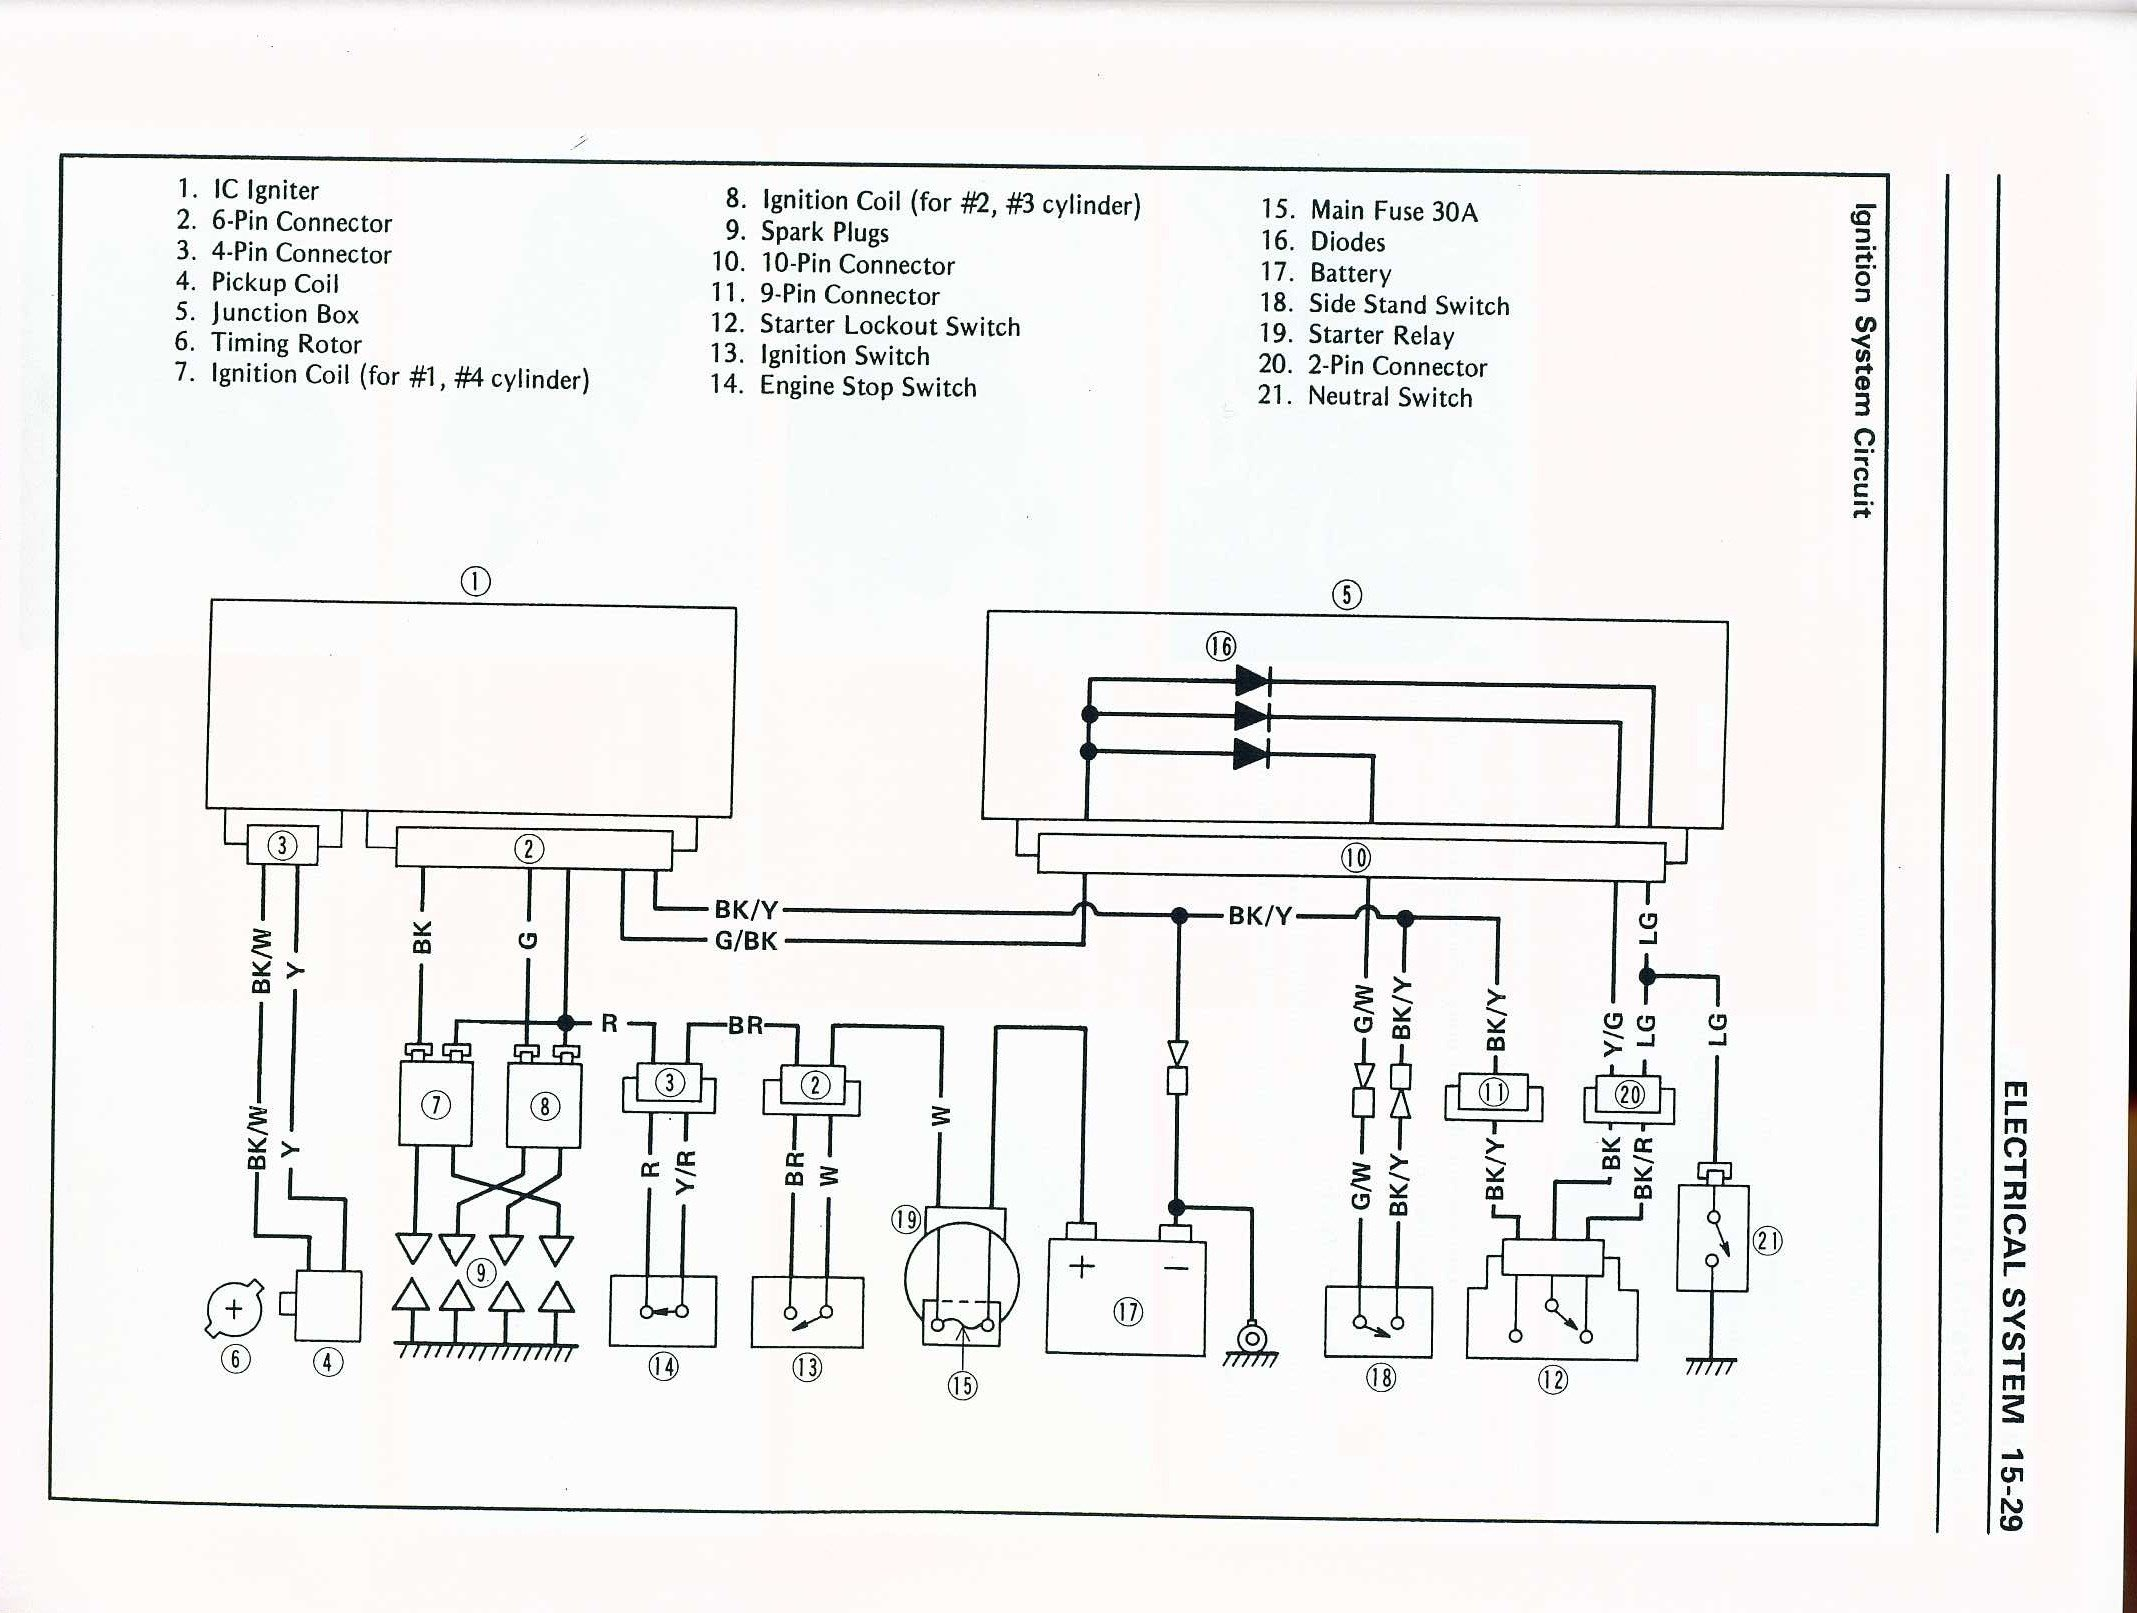 GN_1471] Kawasaki Zx10R Wiring Diagram Download Diagram